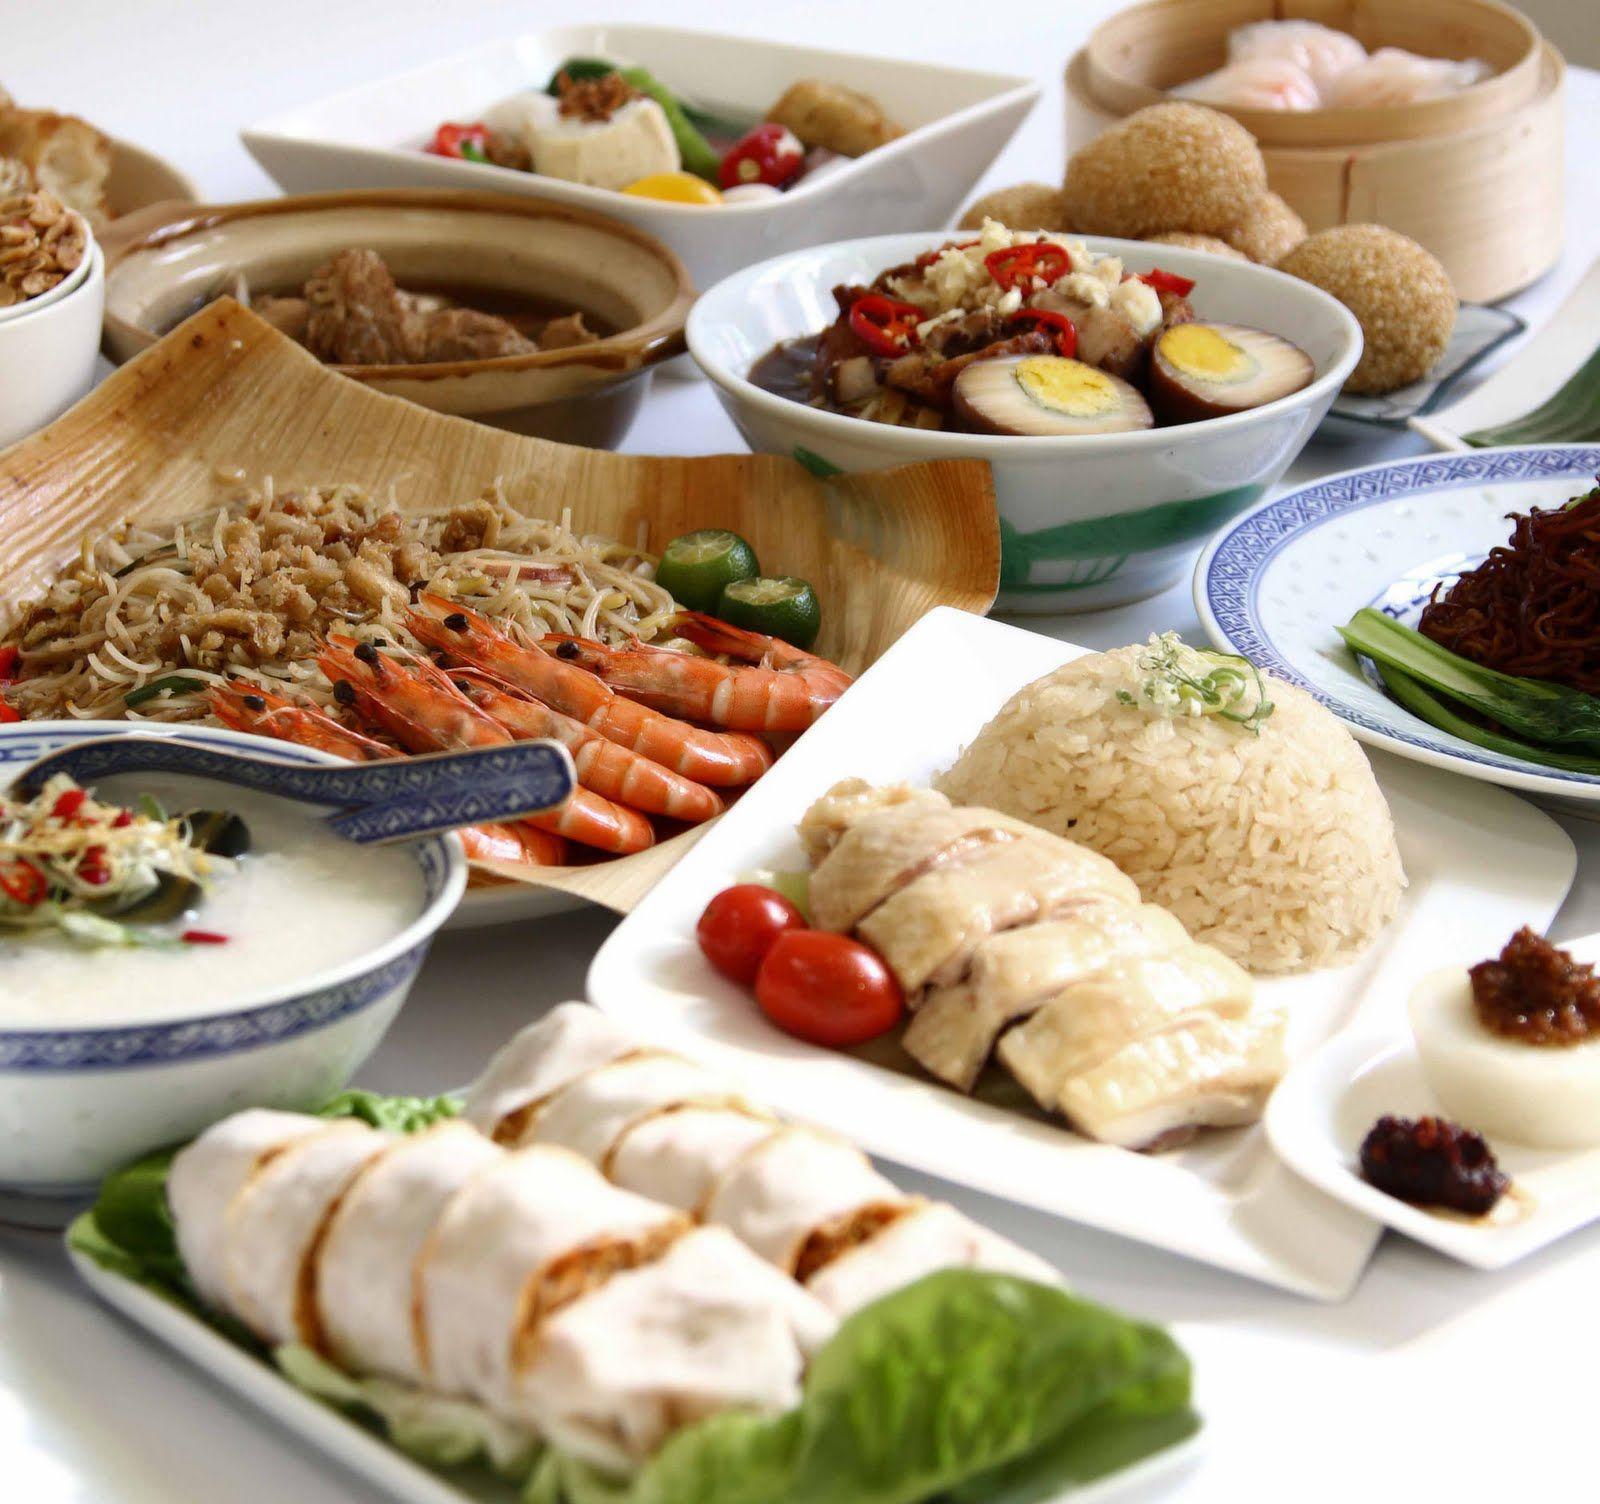 Banquet Singapore Food Court